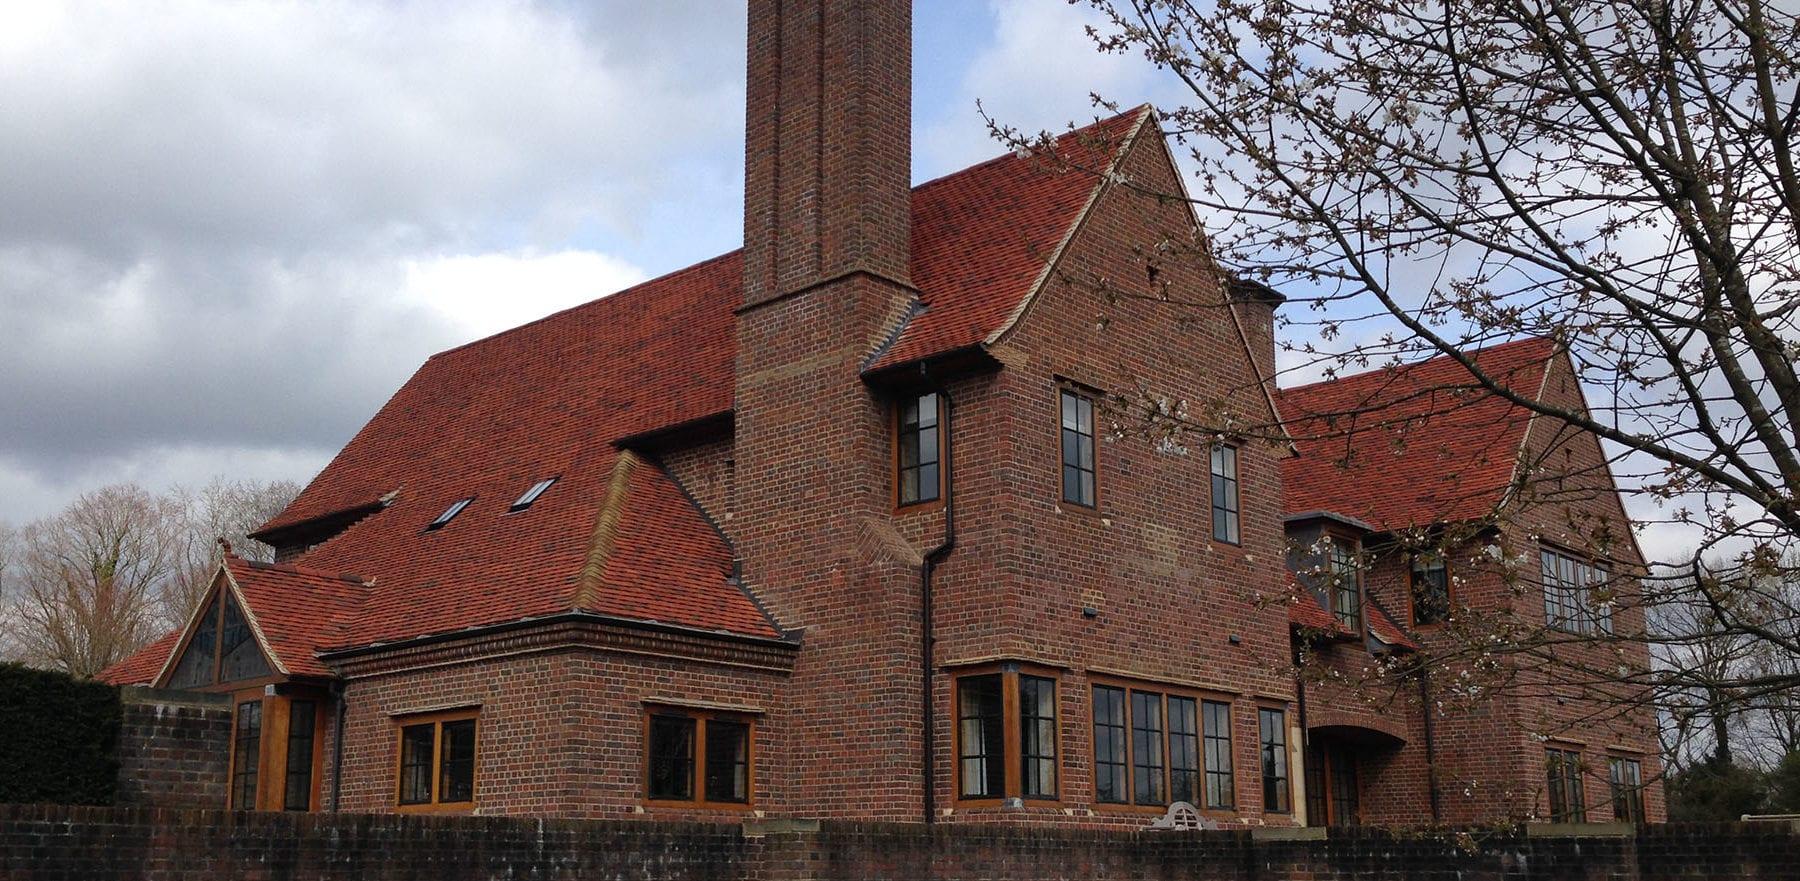 Lifestiles - Handmade Bespoke Clay Roof Tiles - Chipstead, England